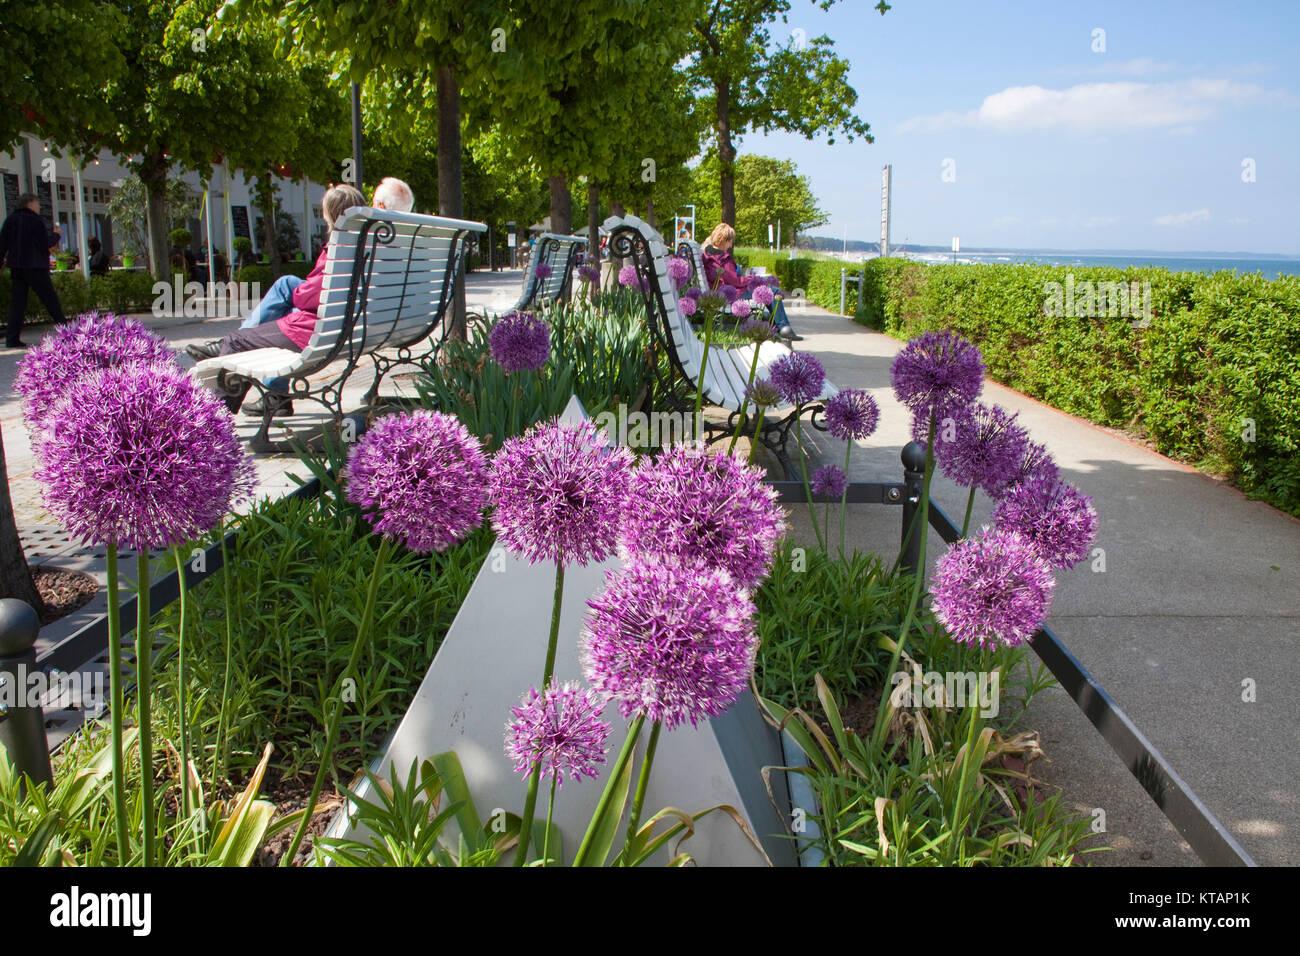 Allium flowers (Allium giganteum) at the beach promenade of Binz, Ruegen island, Mecklenburg-Western Pomerania, - Stock Image